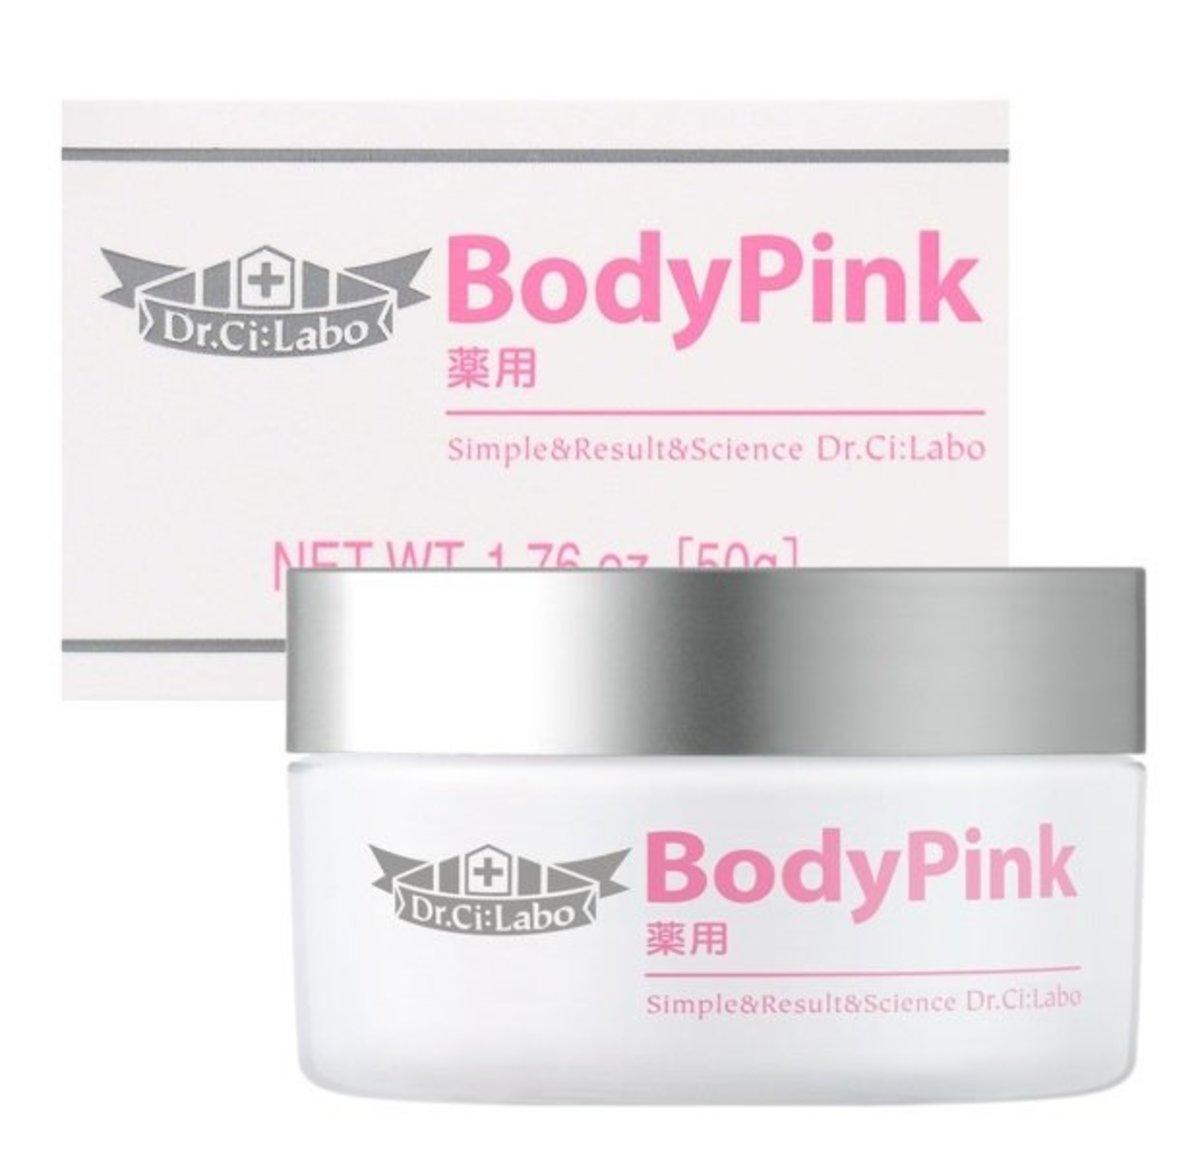 Body Pink Cream 50g